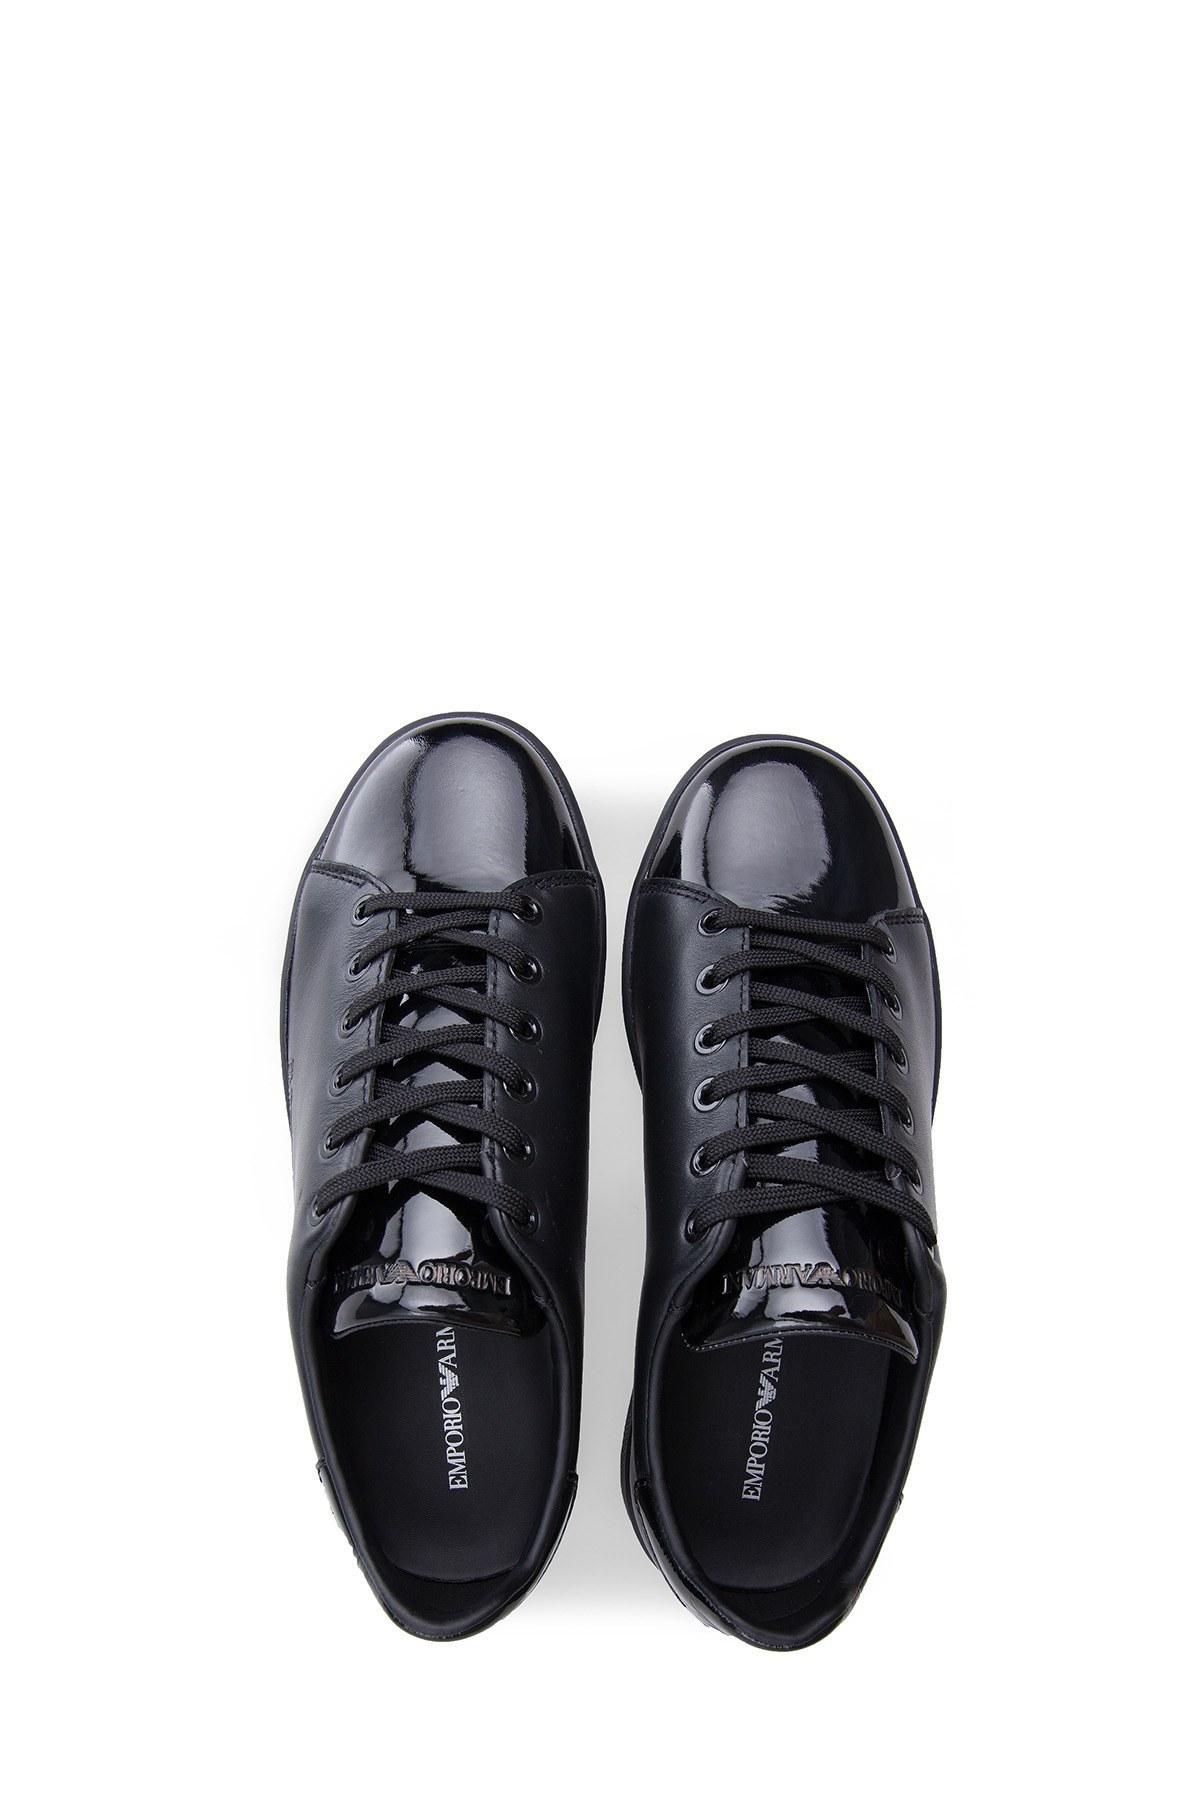 Emporio Armani Kadın Ayakkabı SX3X061XL514K001 SİYAH